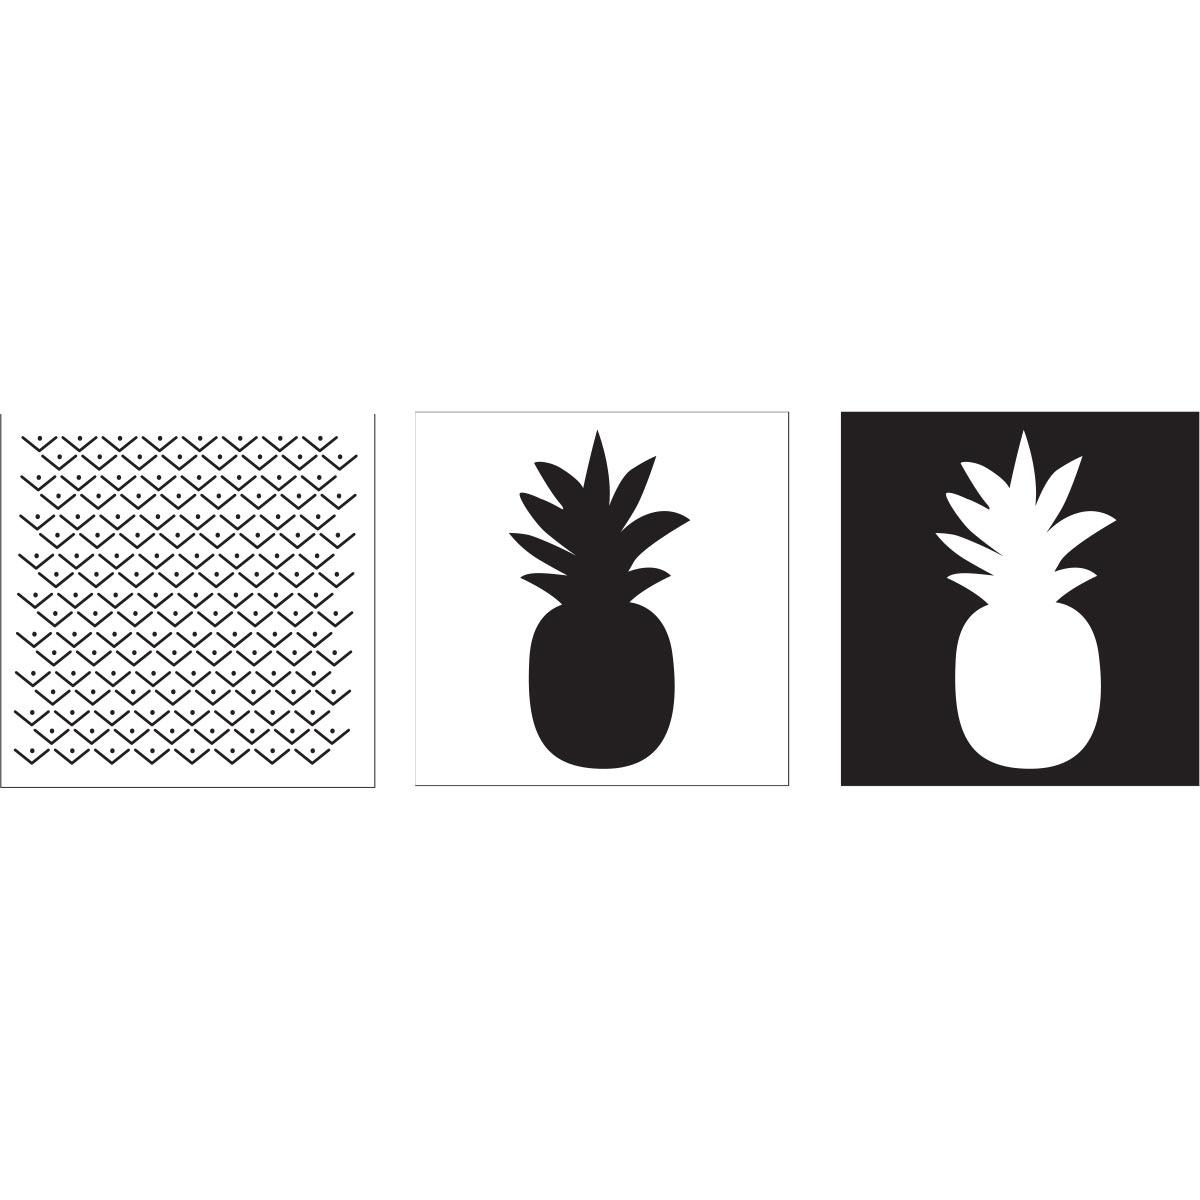 FolkArt ® Layering Stencils - Pineapple